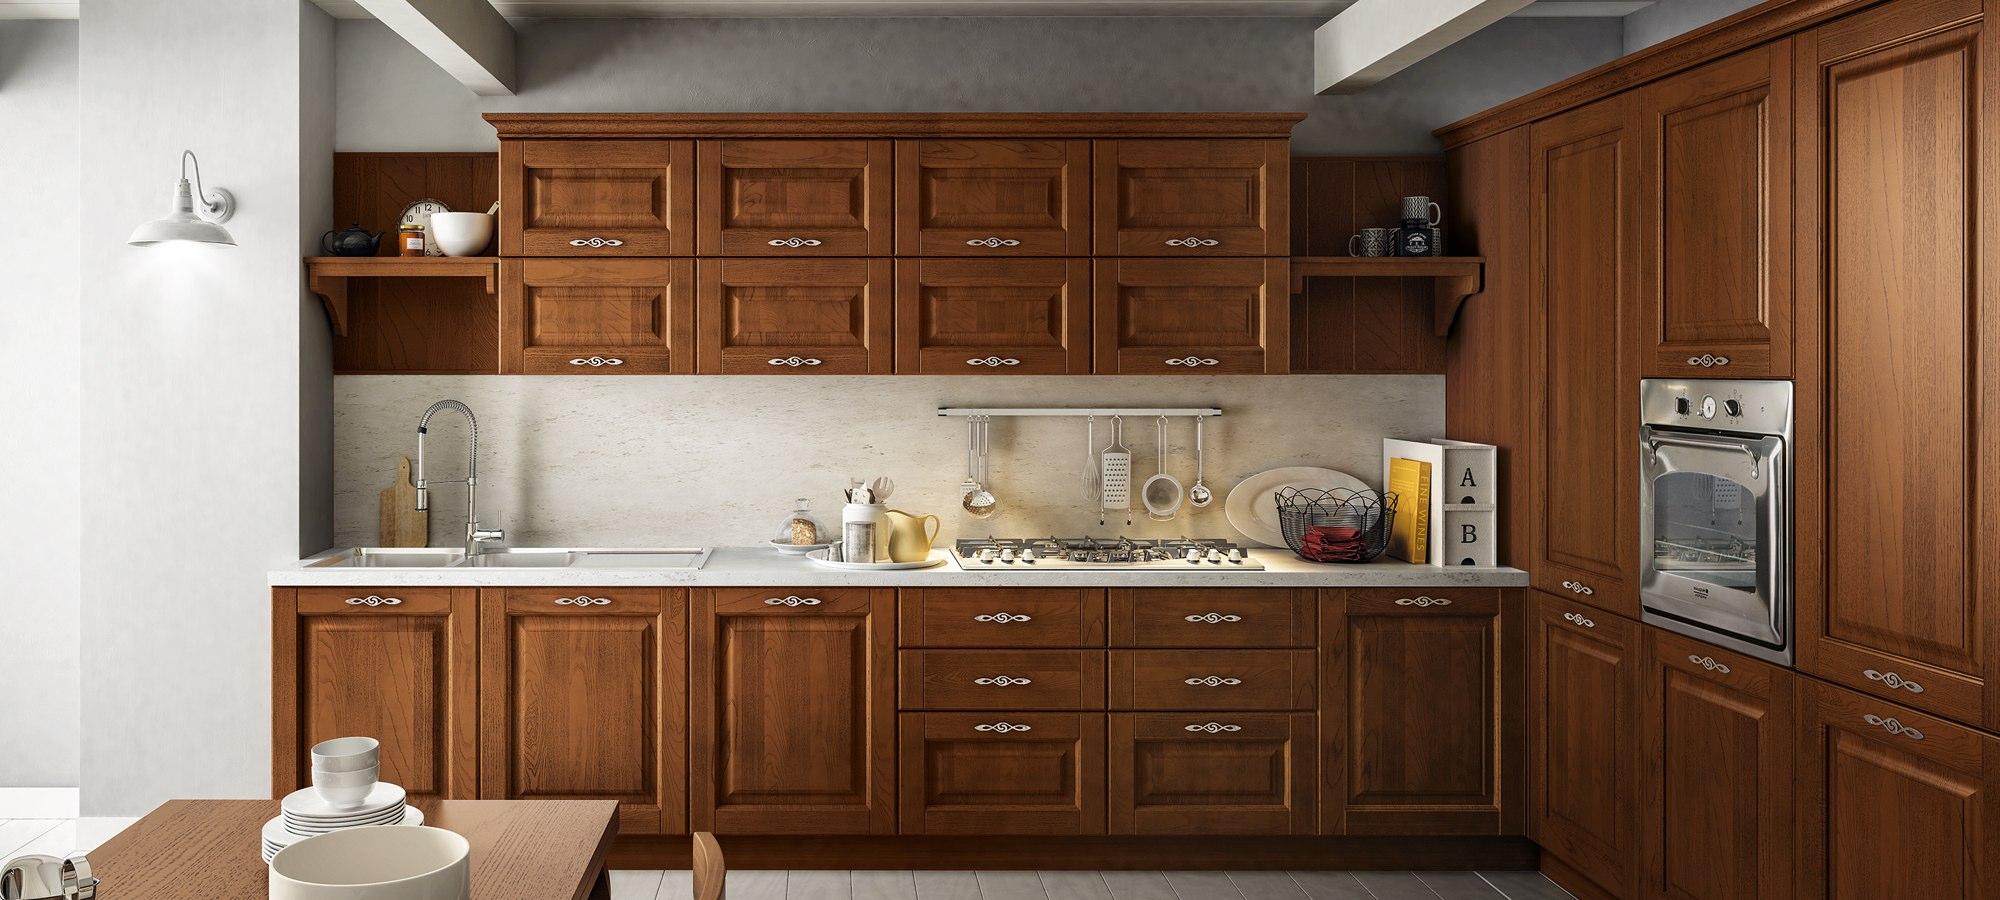 katalog - adda möbel - die beste möbel aus italien